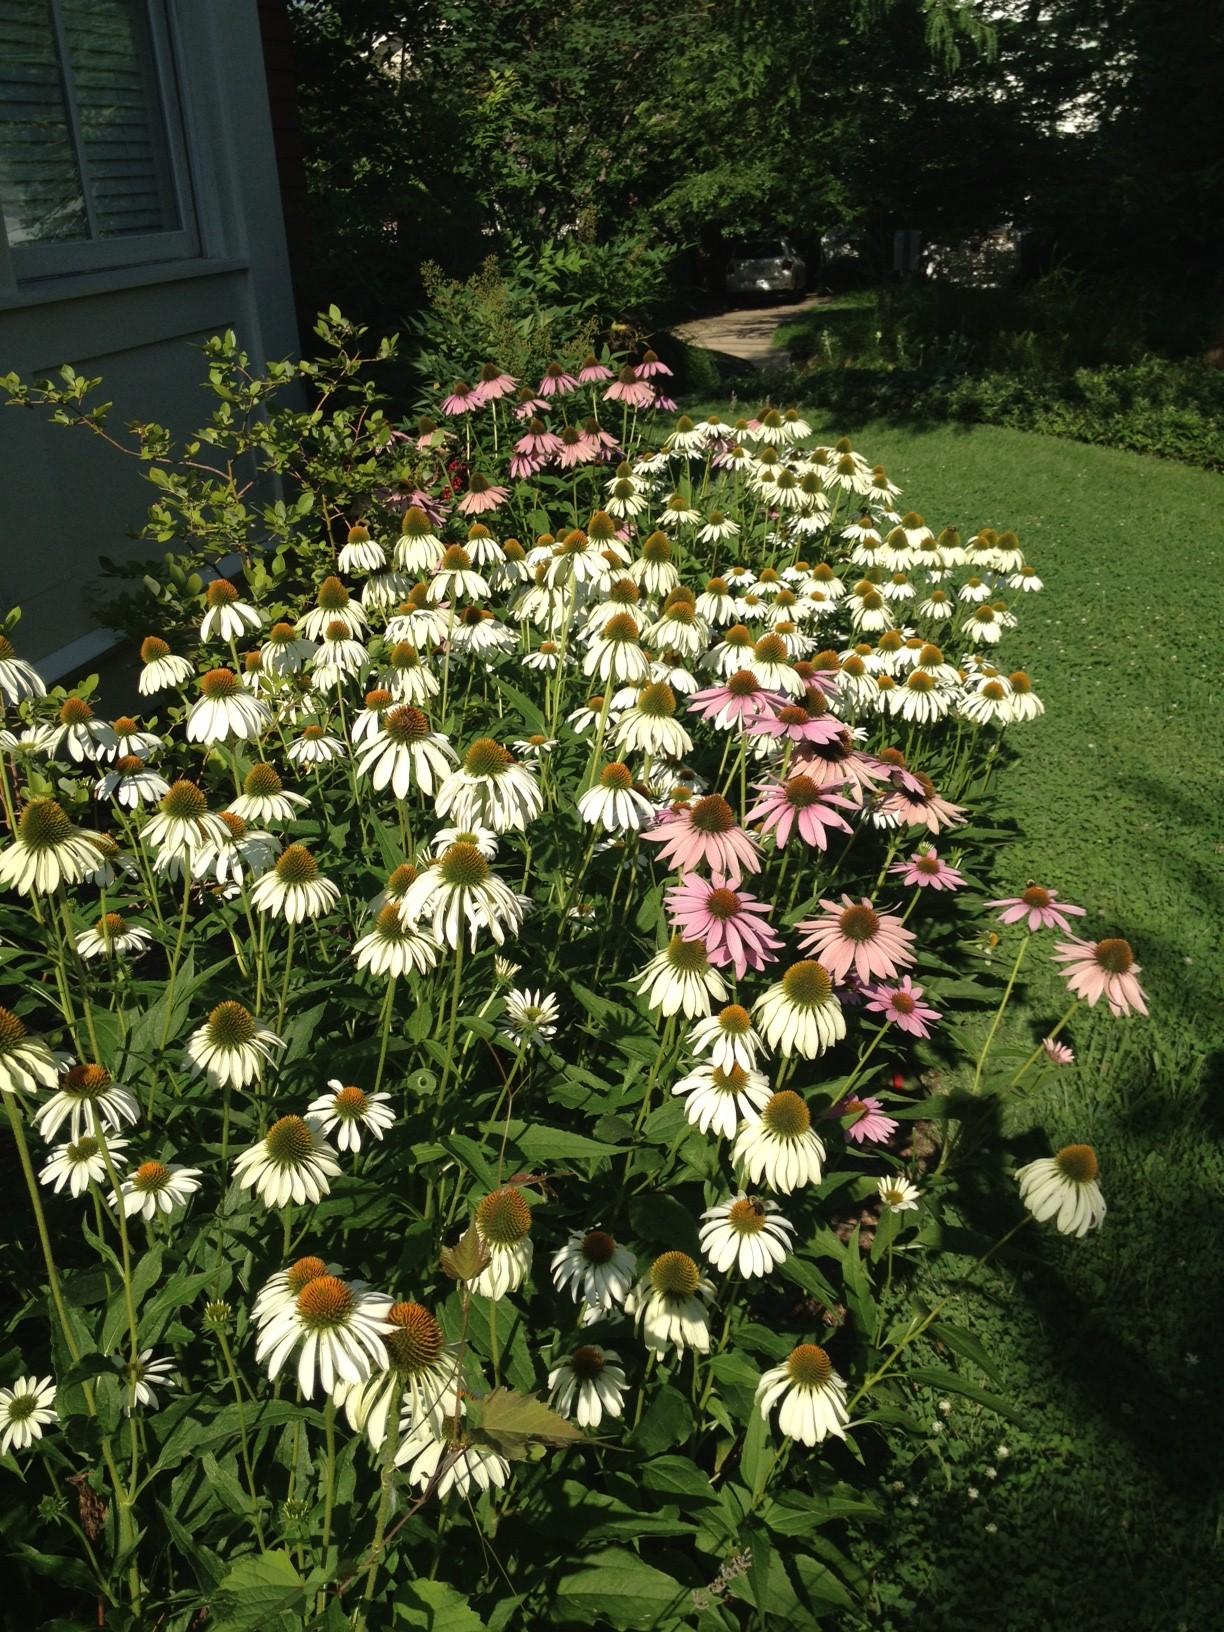 Echinacea border planting